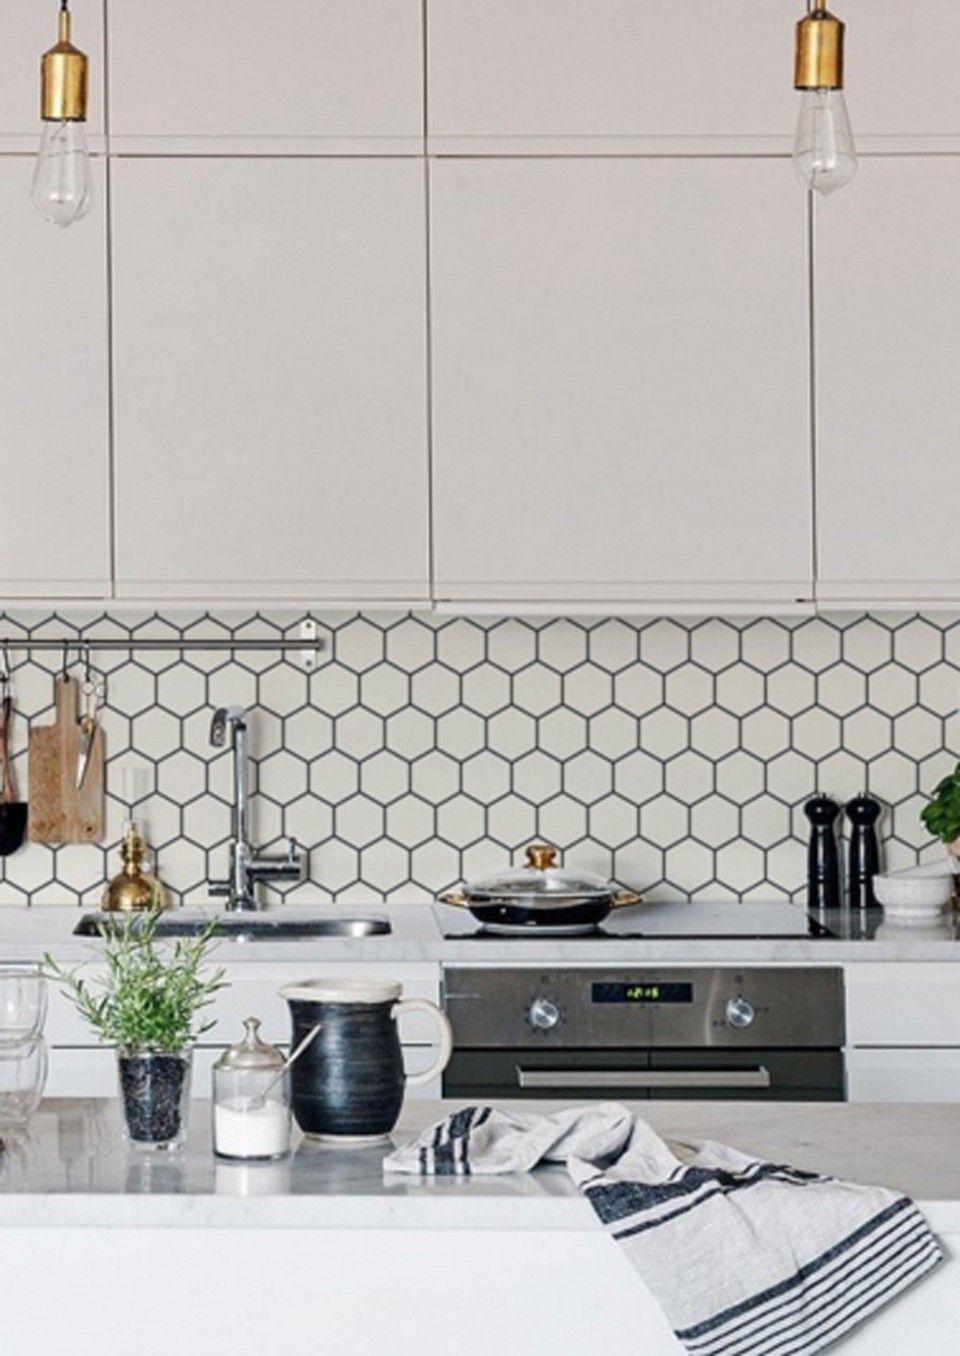 - Kitchen Wall Wallpaper - Hexagon Kitchen Feature Wall, Kitchen